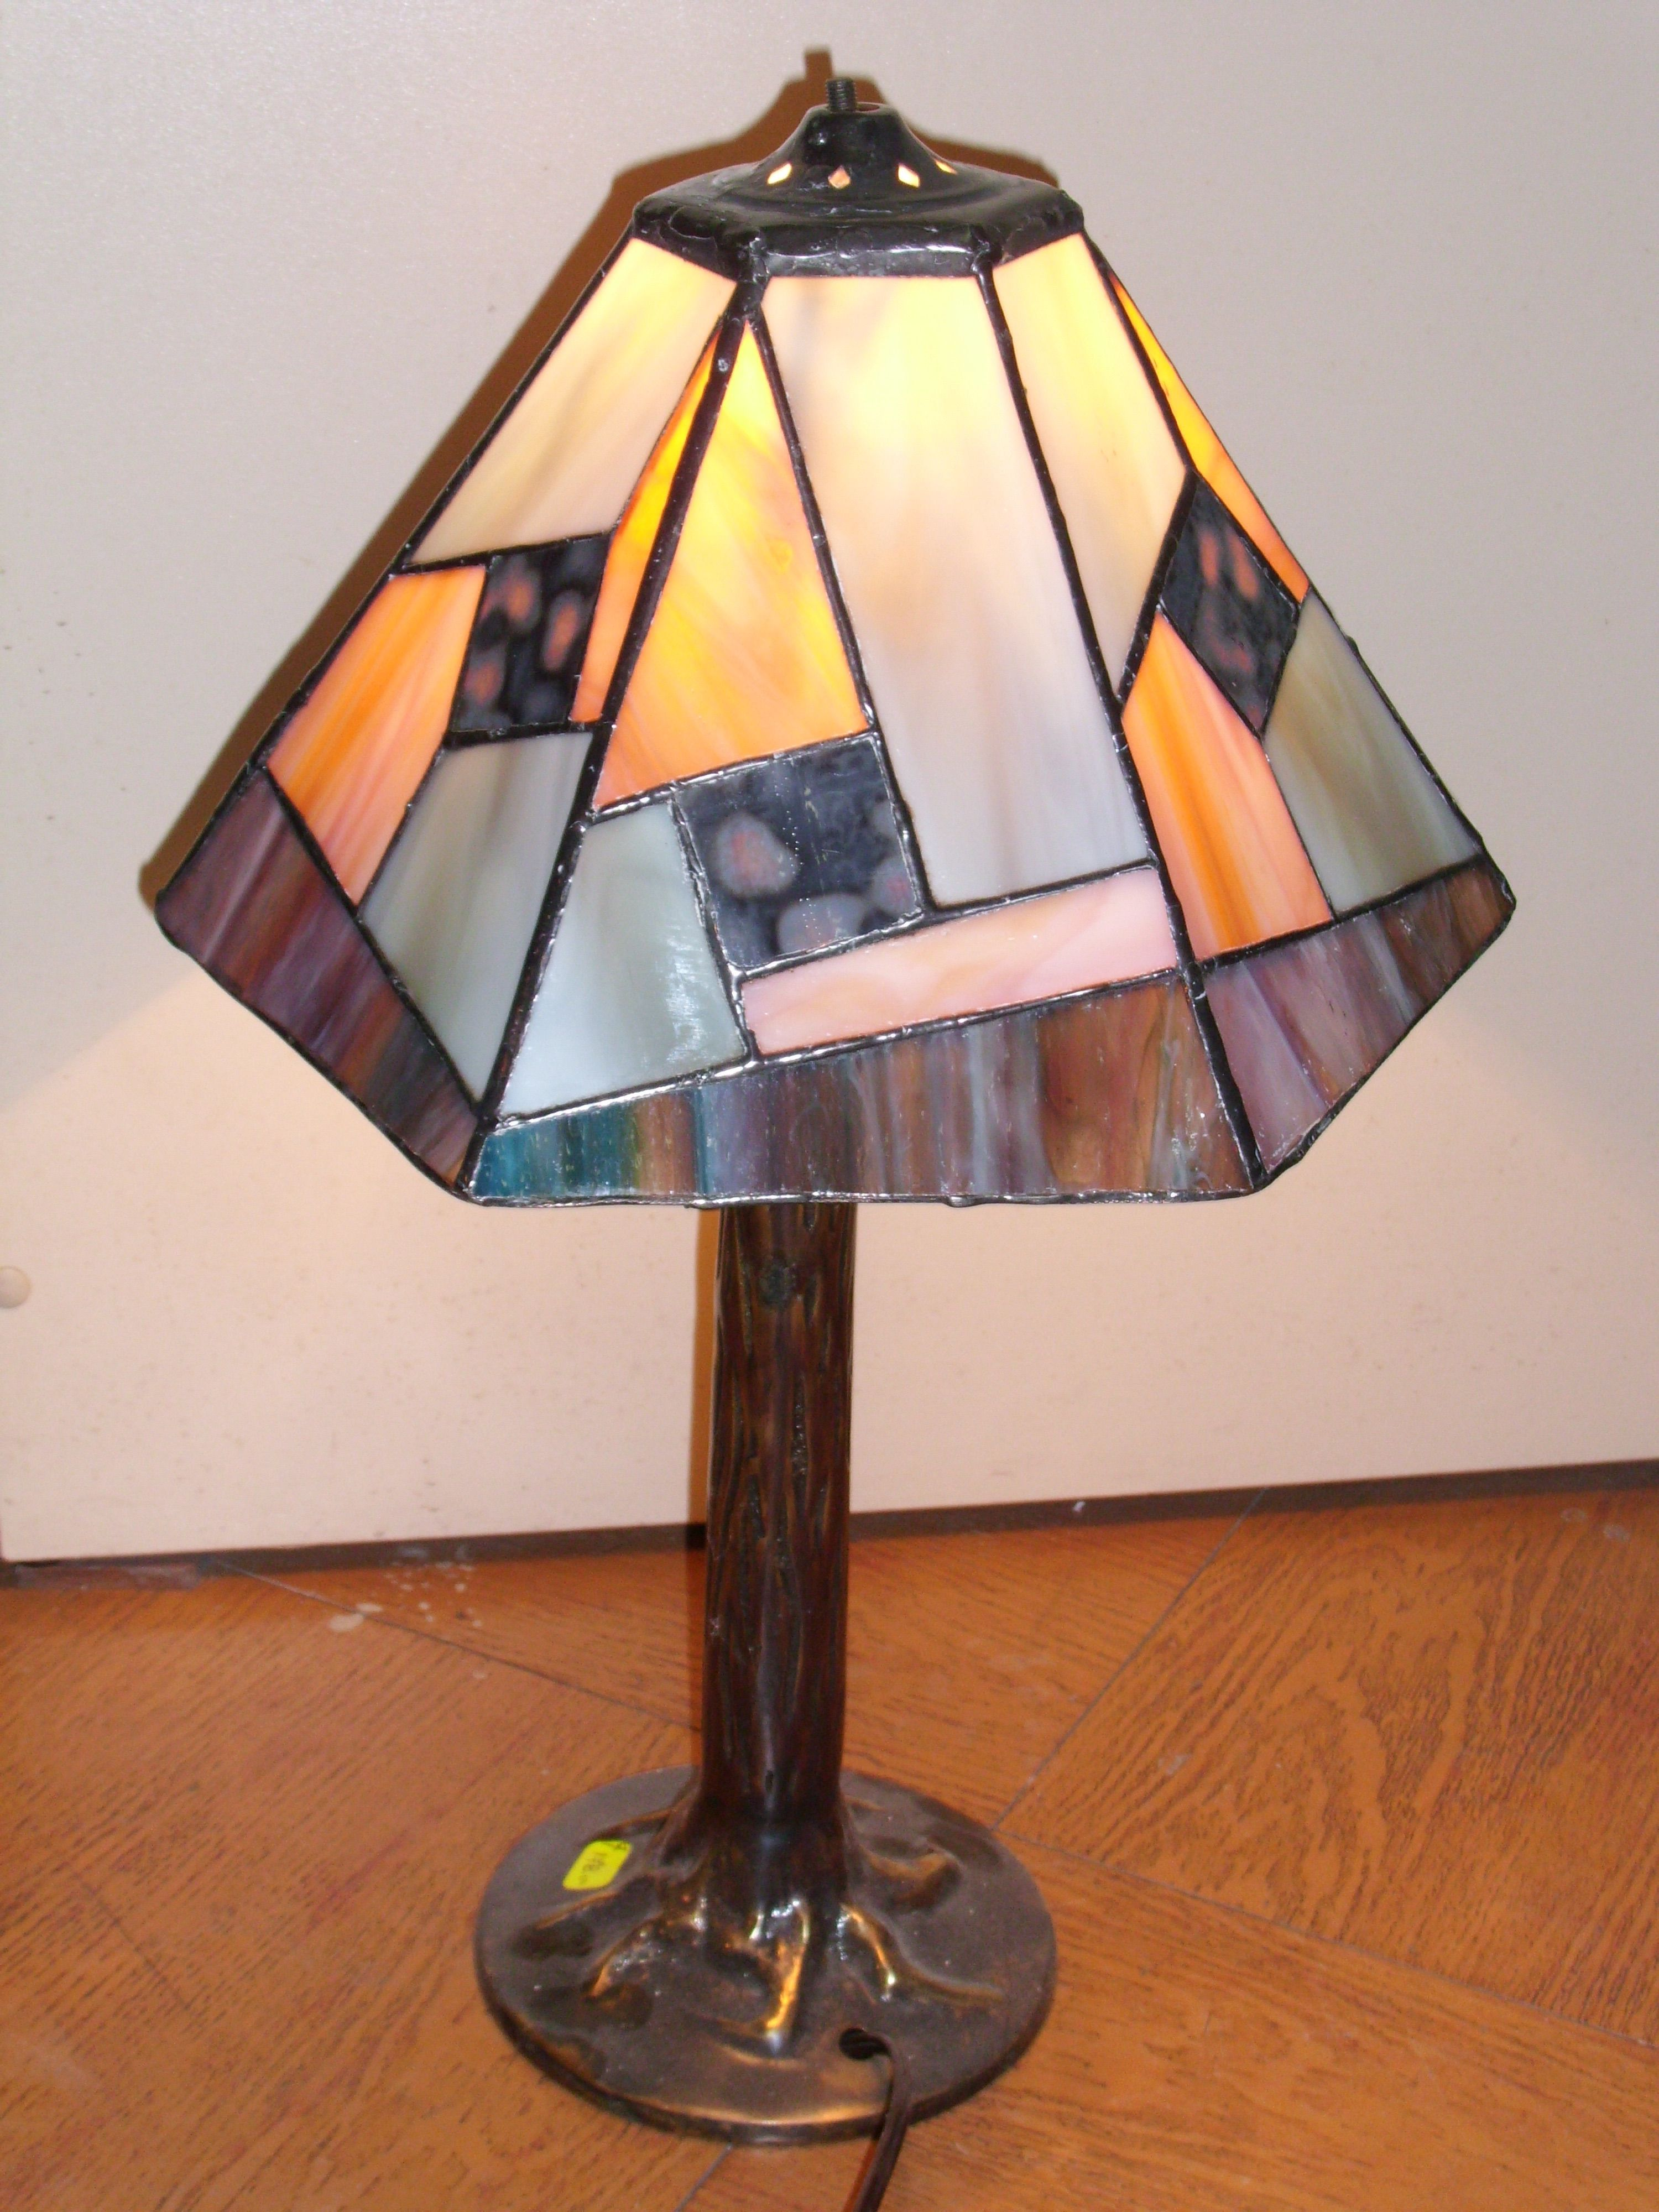 Lampara Vitro Tecnica Tifani Stained Glass Lamp Shades